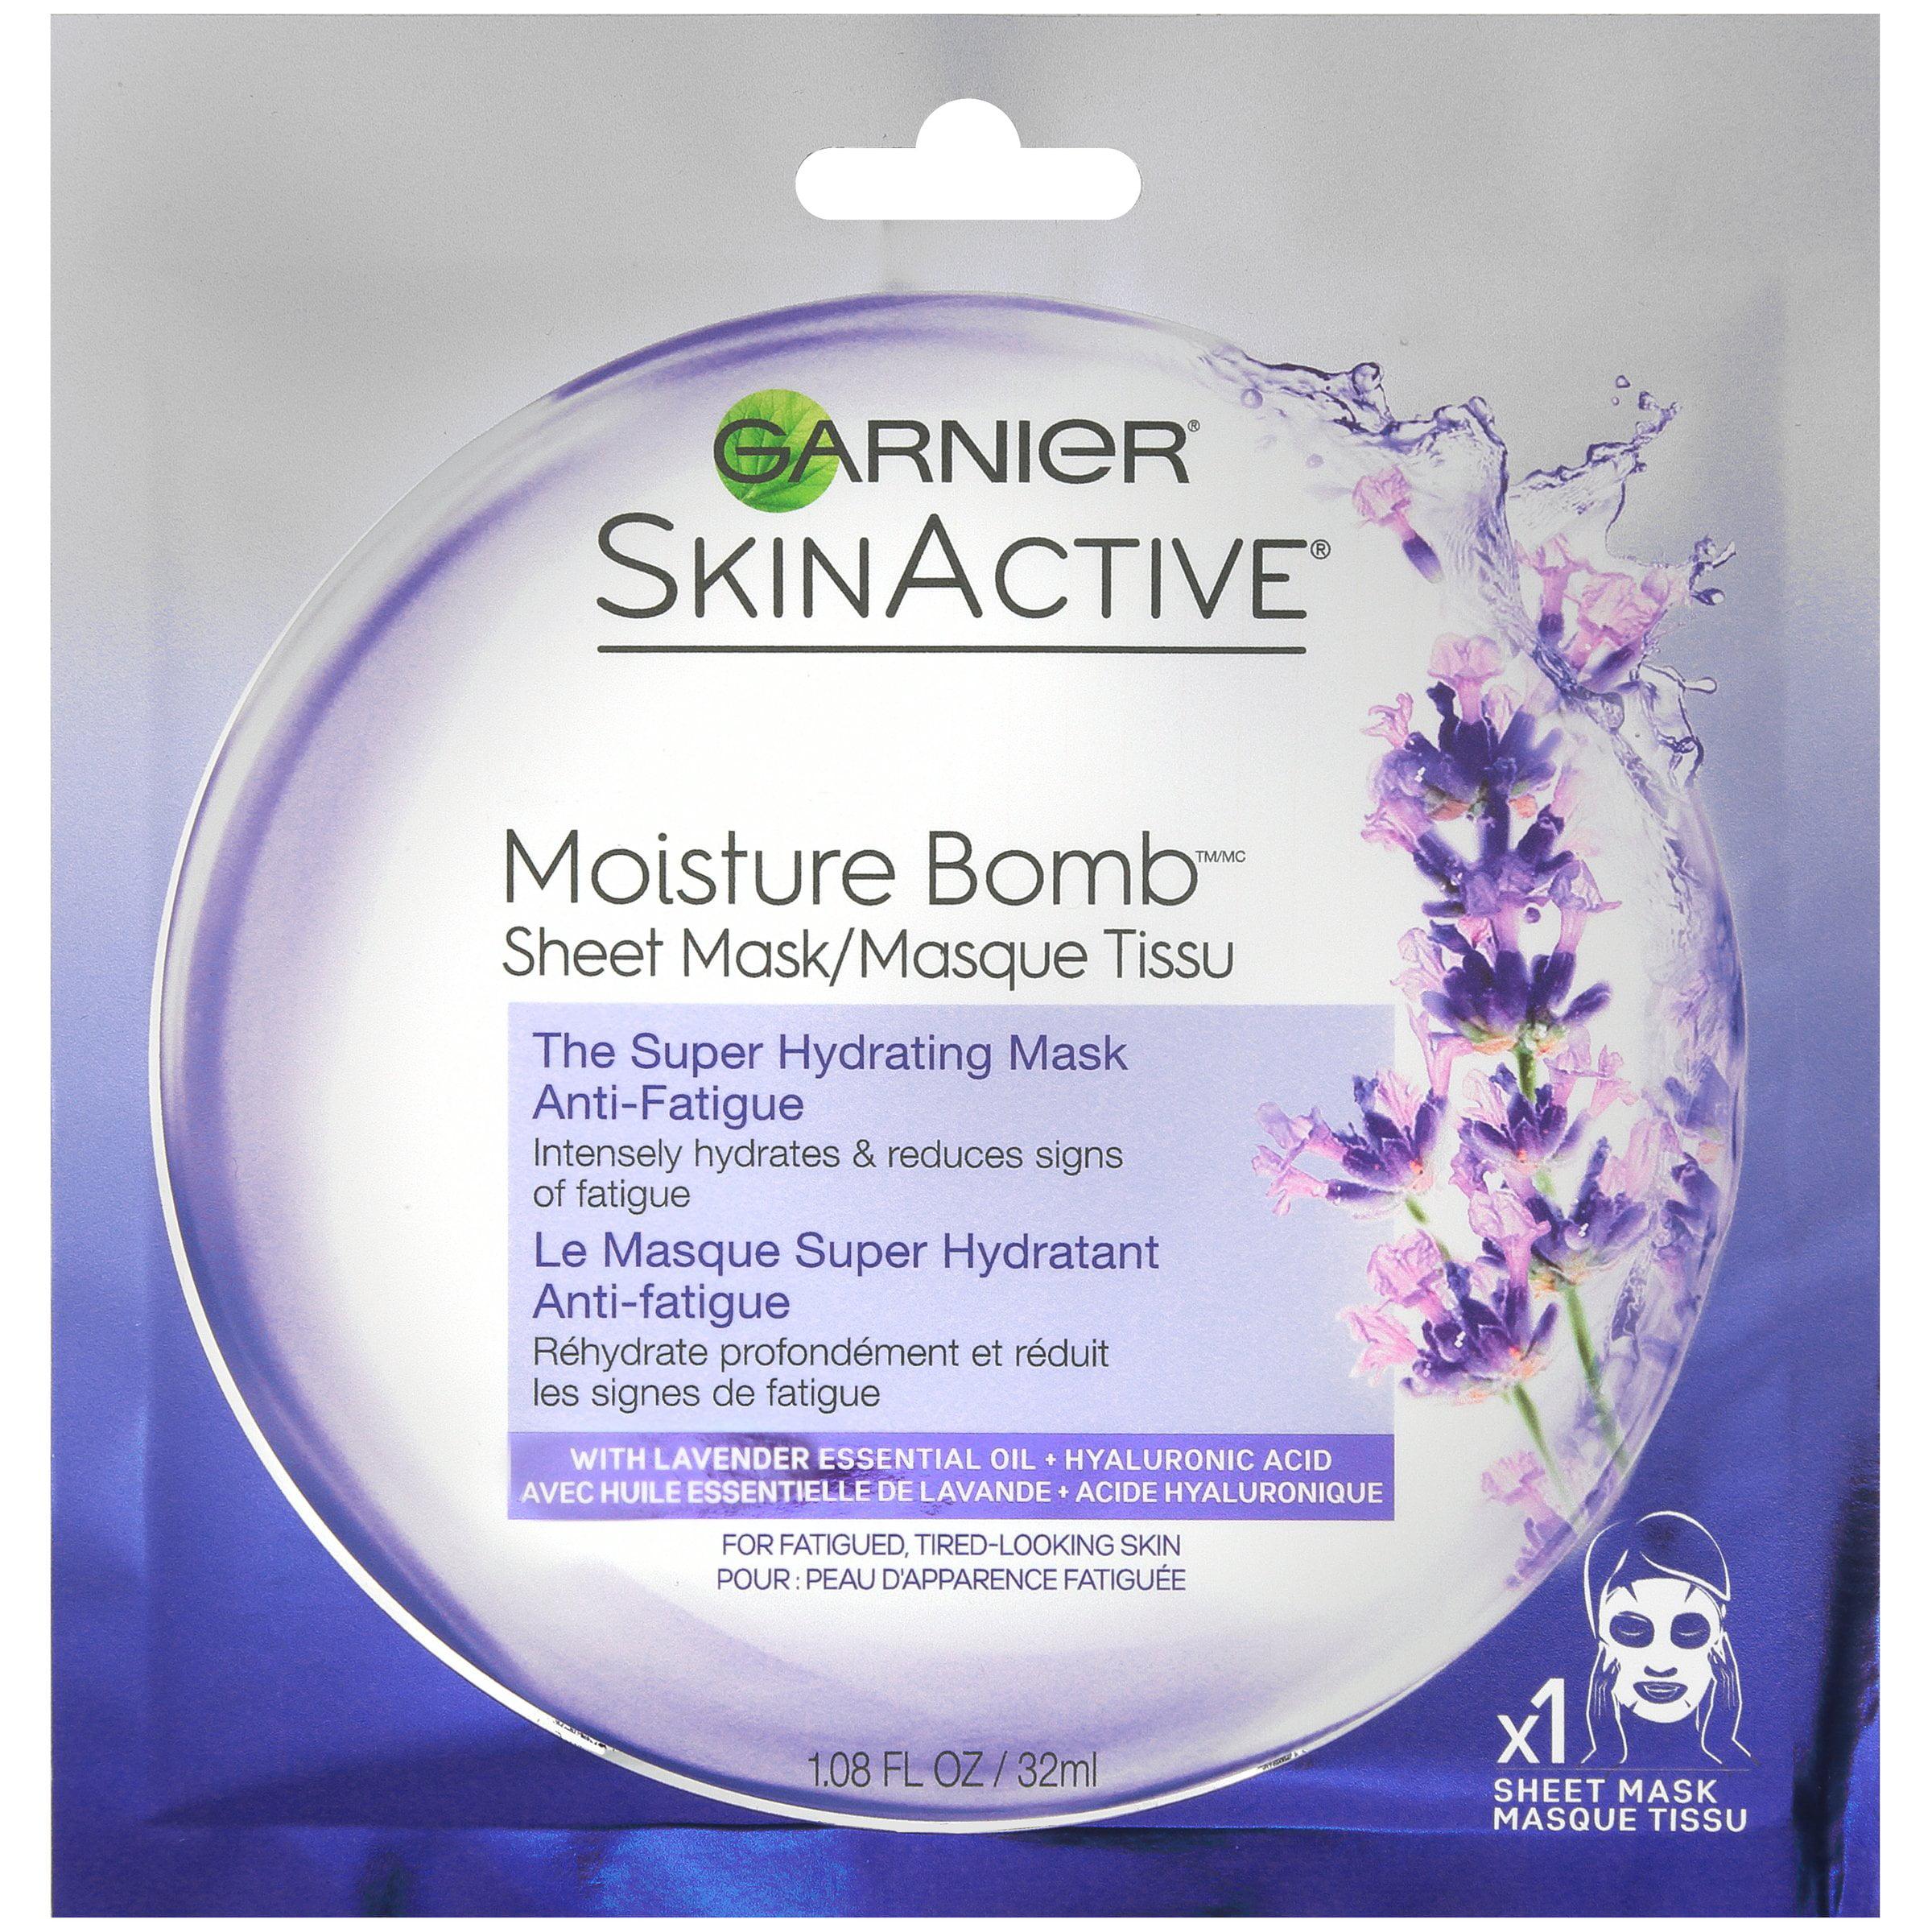 Garnier SkinActive Moisture Bomb The Super Hydrating Anti-Fatigue Sheet Mask 1.08 fl. oz. Pack